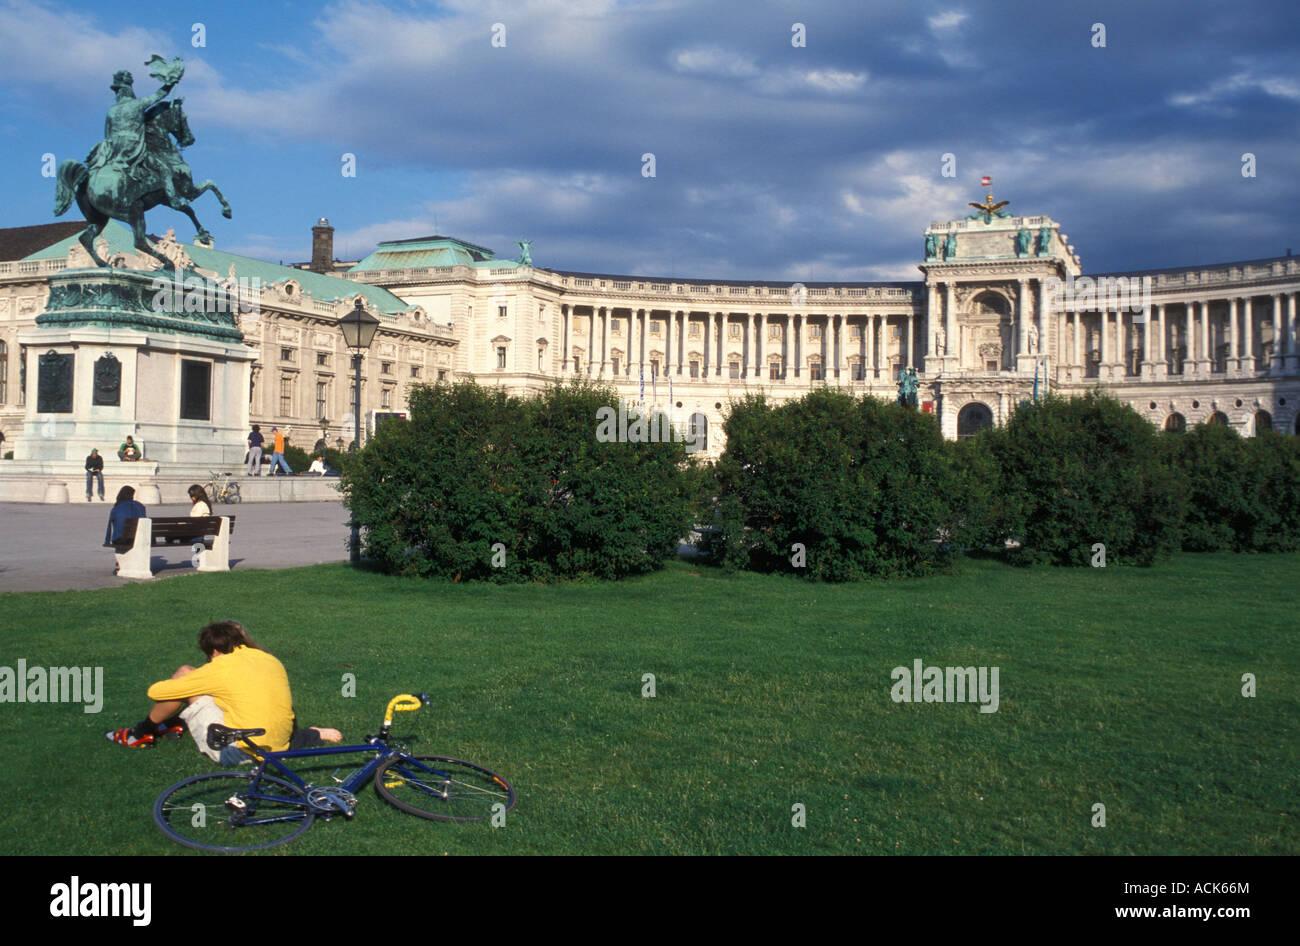 Heldenplatz place in front of Neue Hofburg building in Vienna Austria - Stock Image